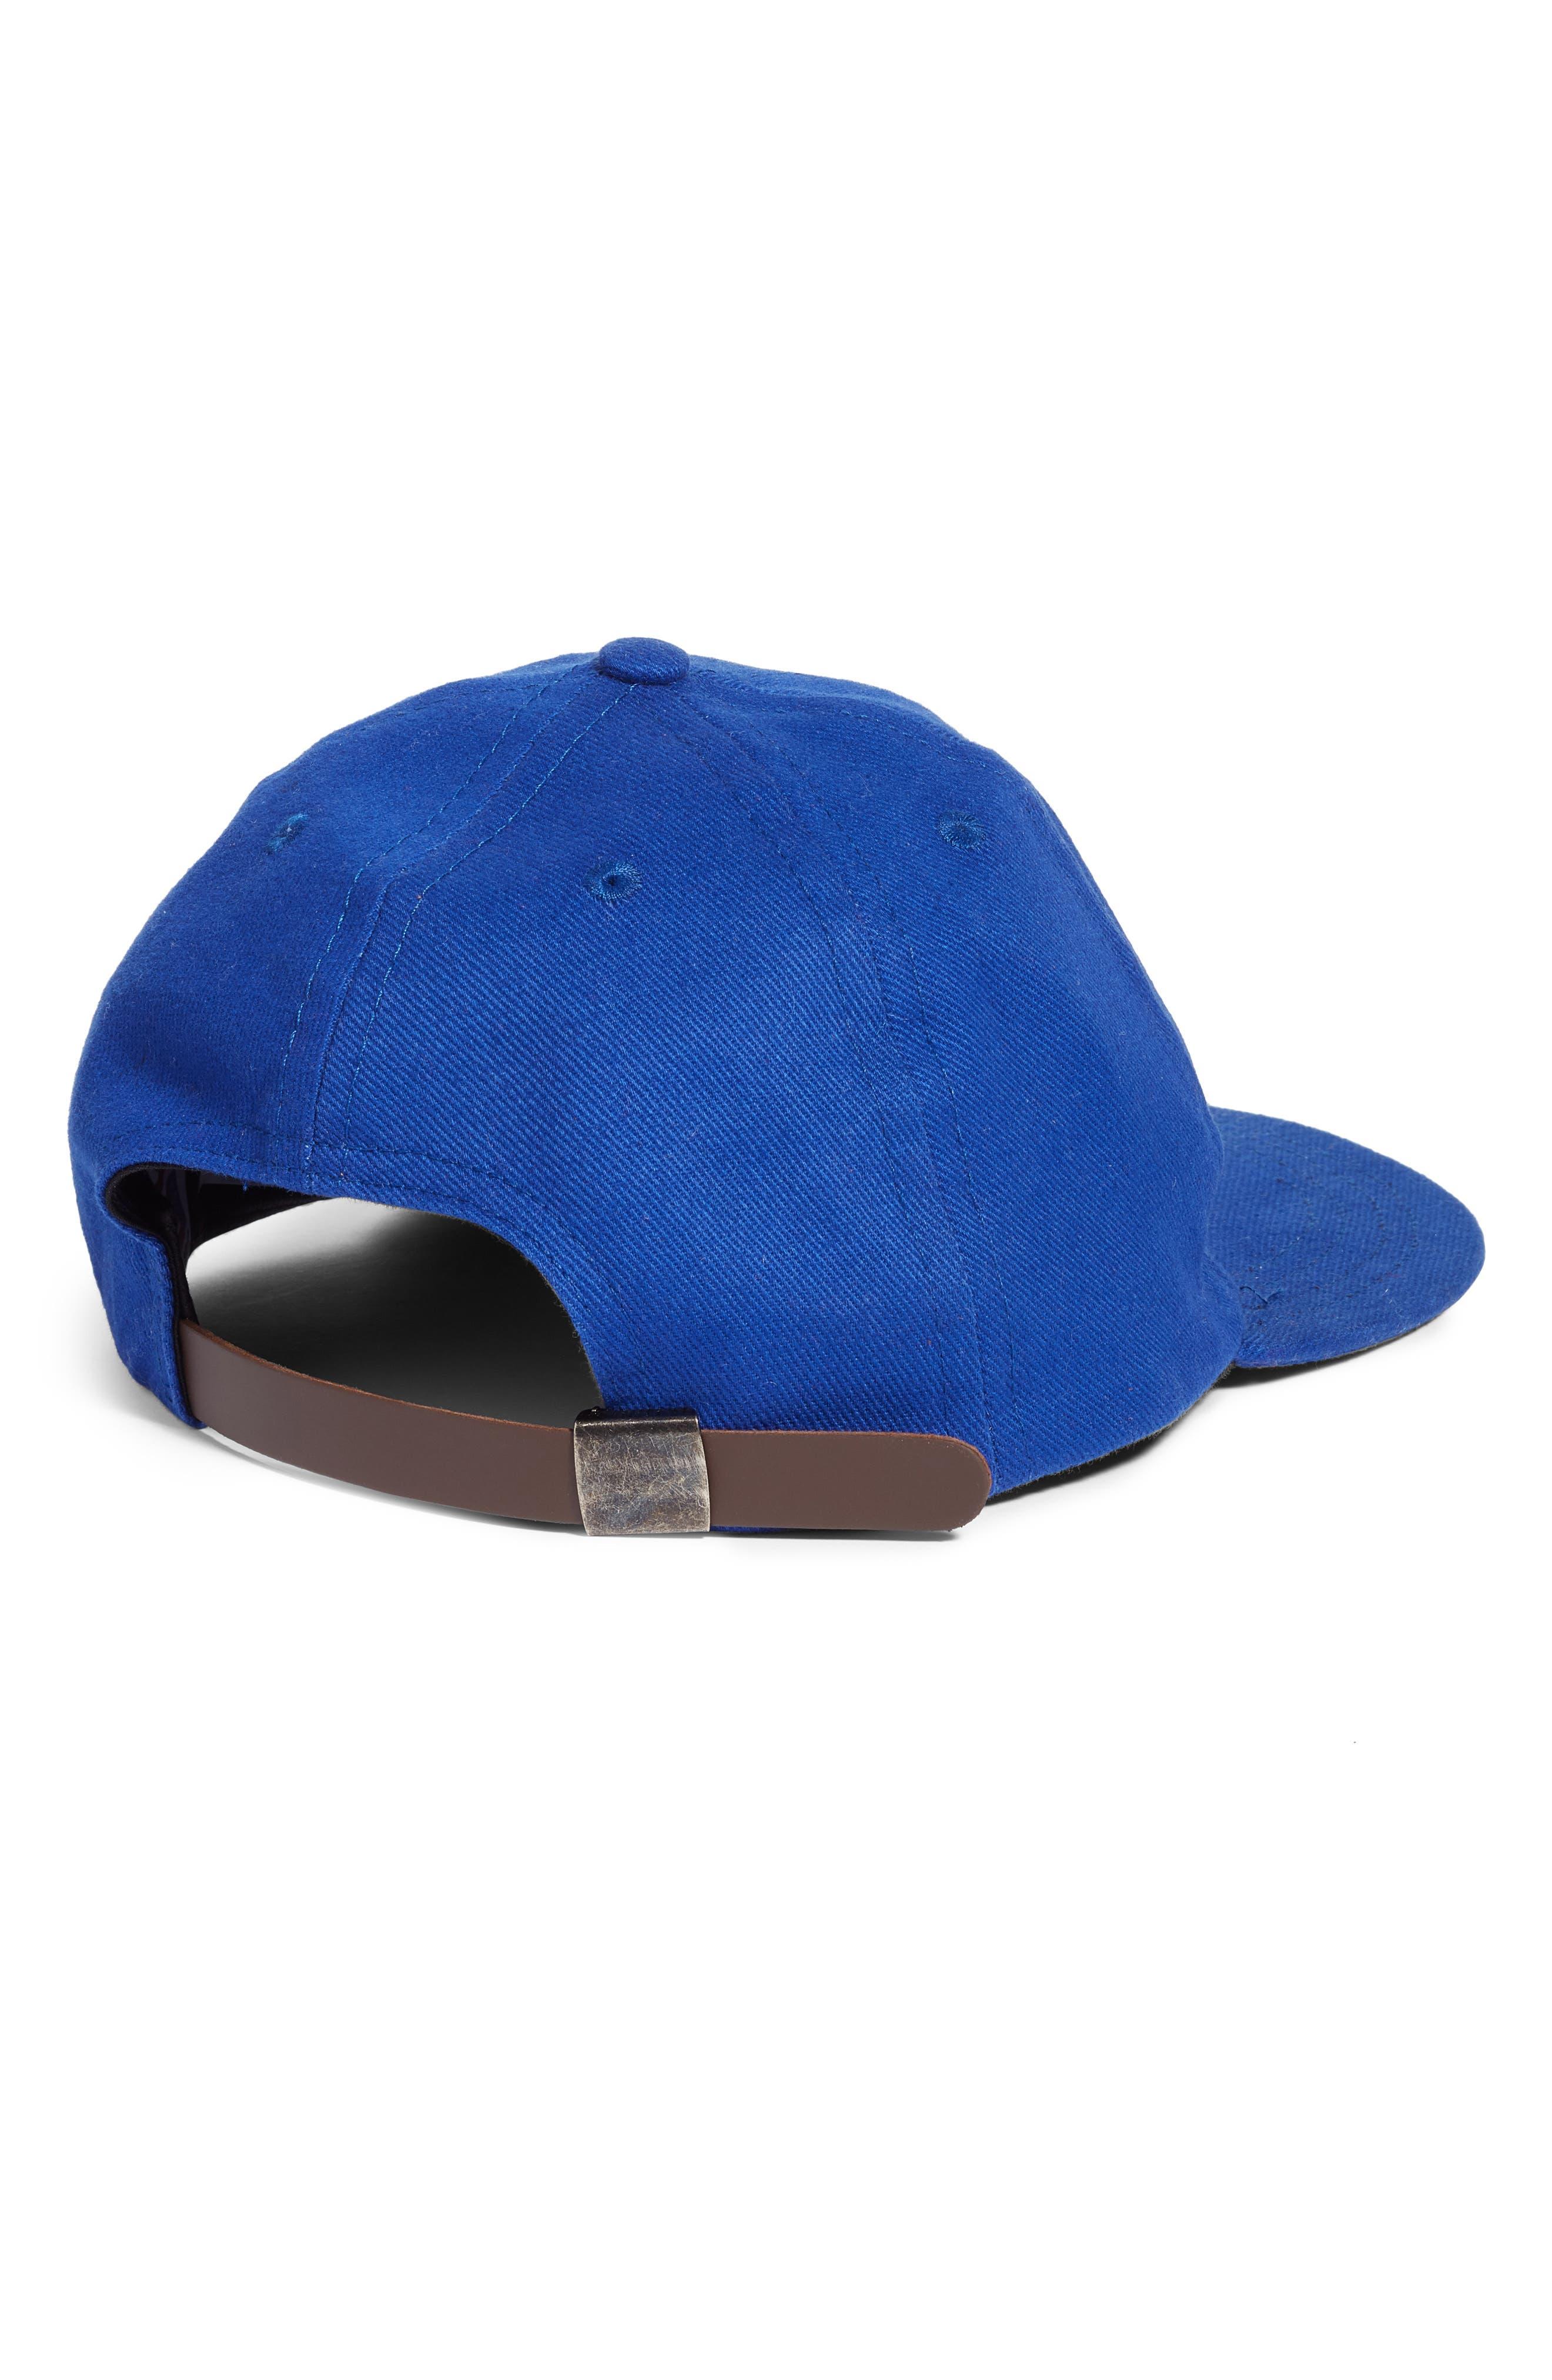 Beaded Cactus Baseball Hat,                             Alternate thumbnail 2, color,                             400